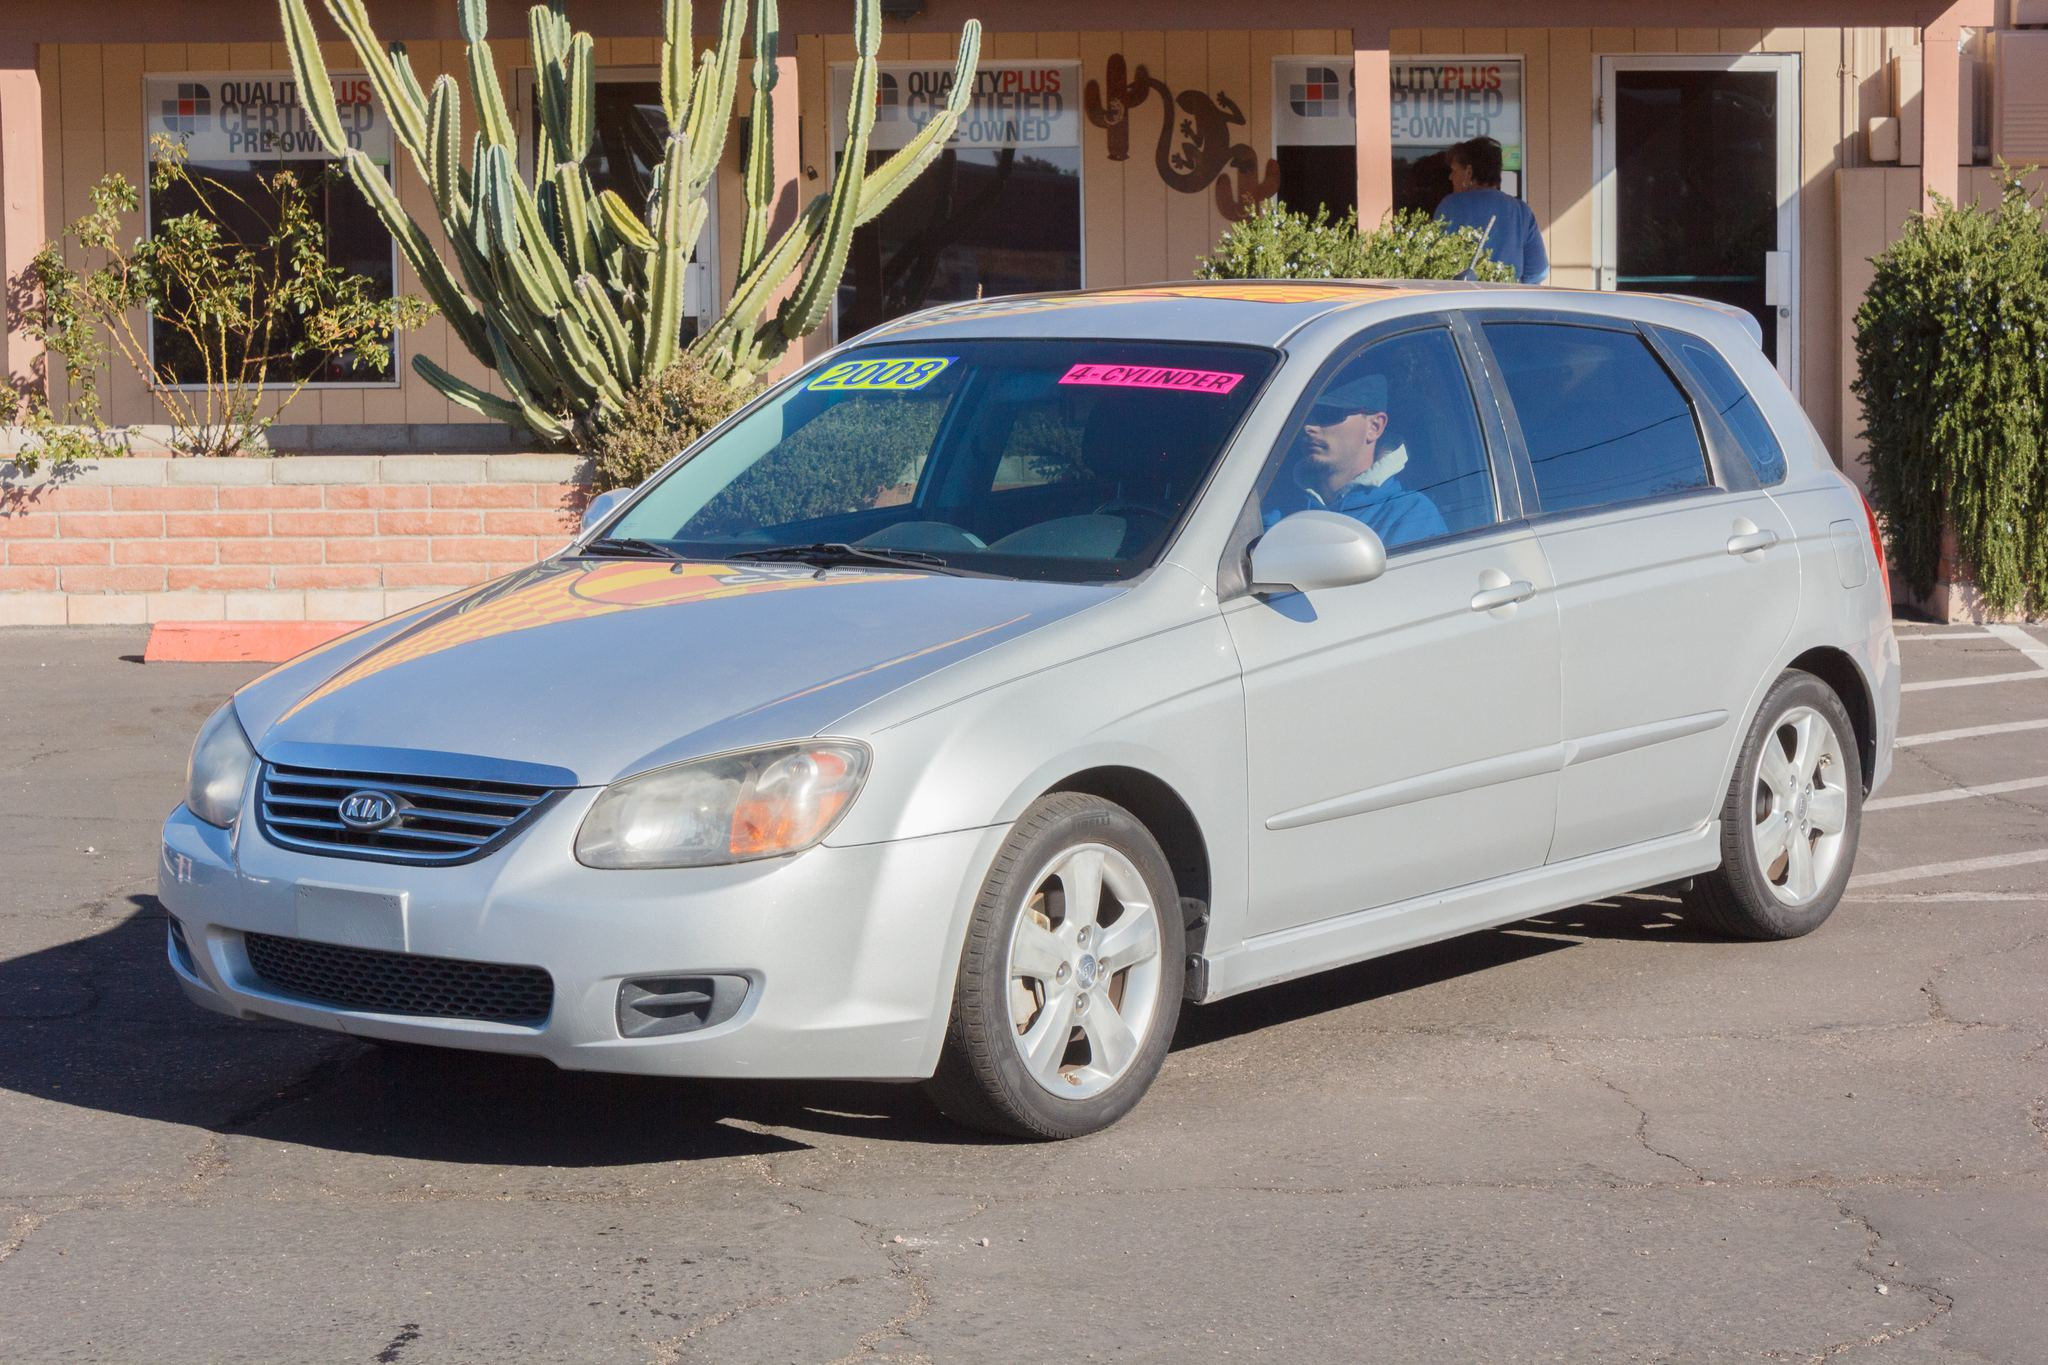 Photo of 2008 Kia Spectra 5d Sedan Spectra5 Auto Bright Silver Metallic